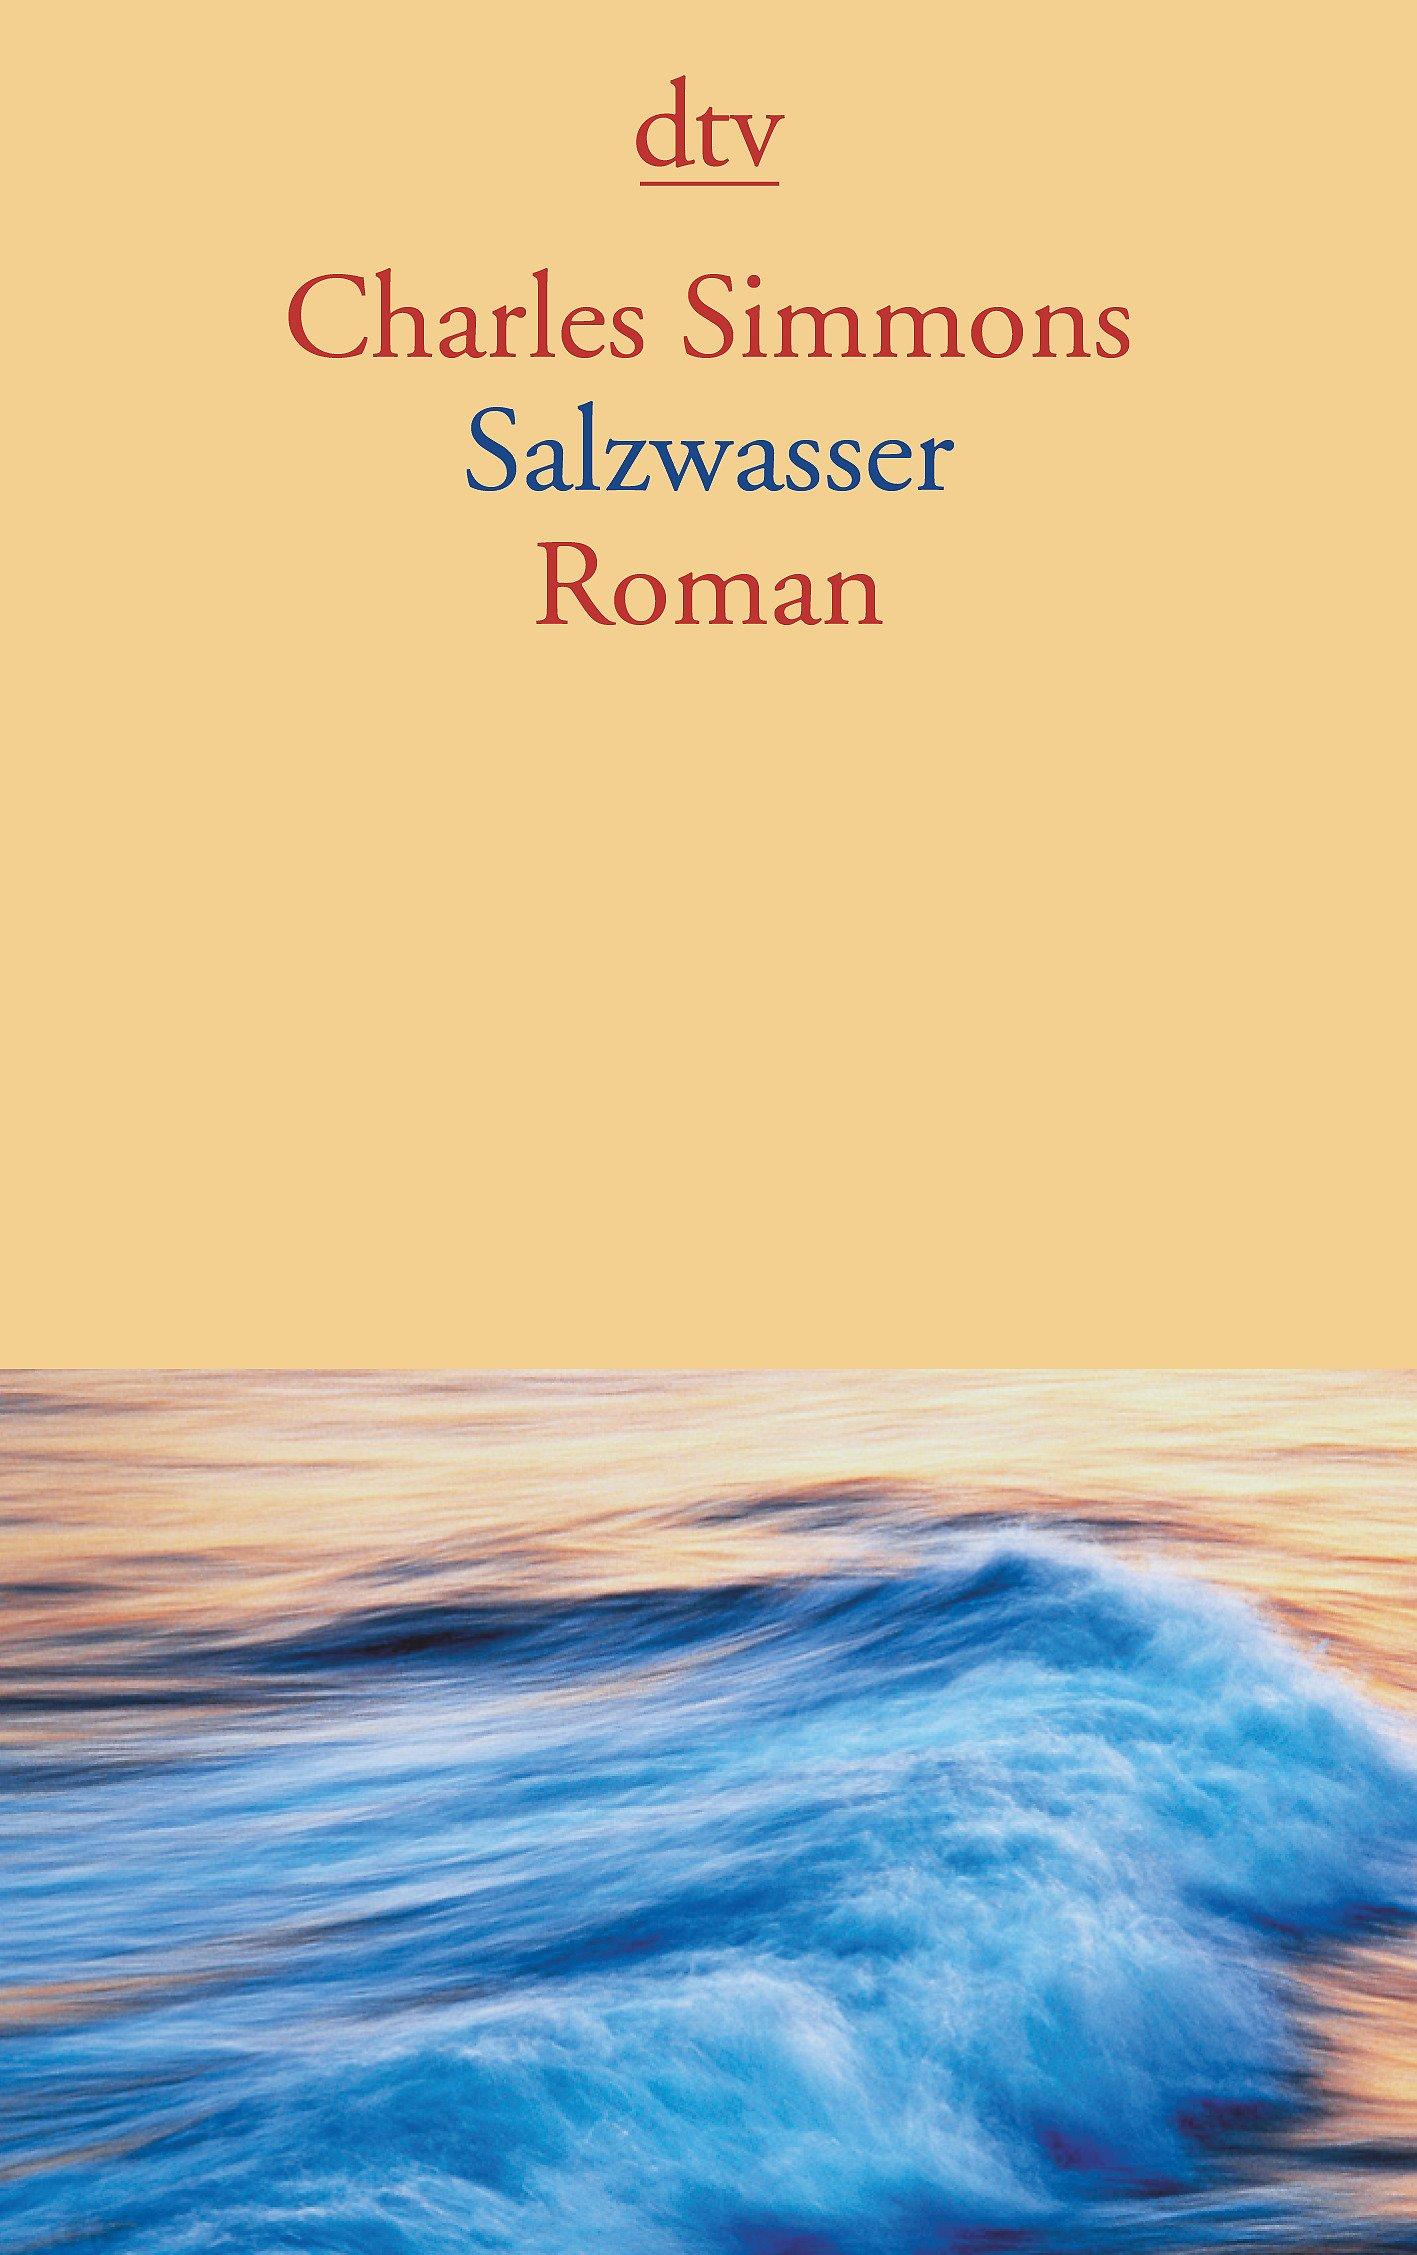 Salzwasser: Roman